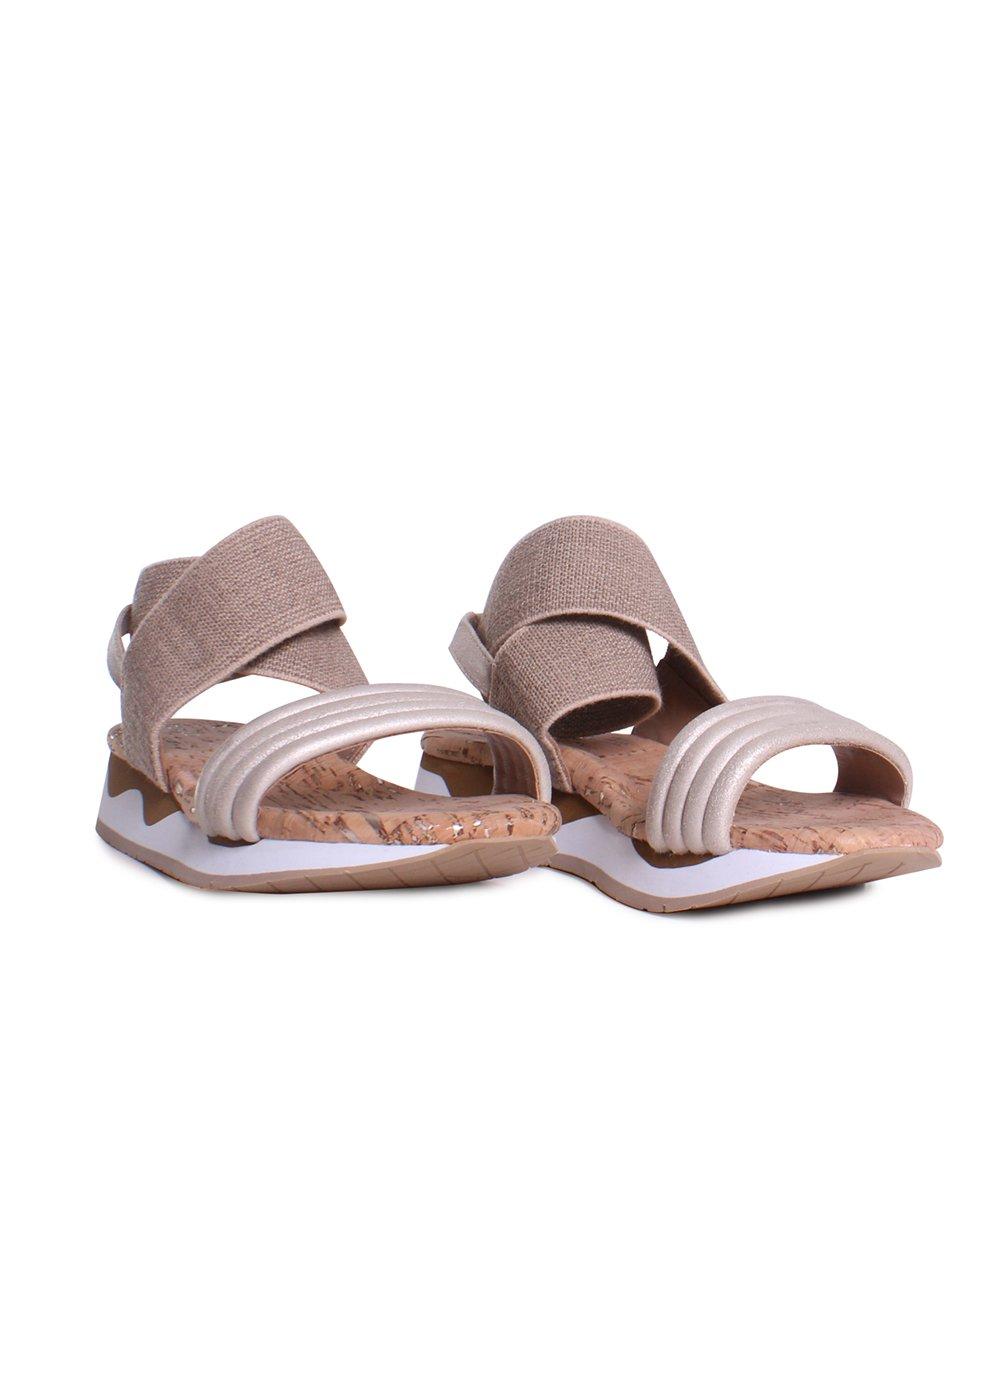 Donald J Pliner Women's Shaye Sport Sandal, Platino, 9 Medium US